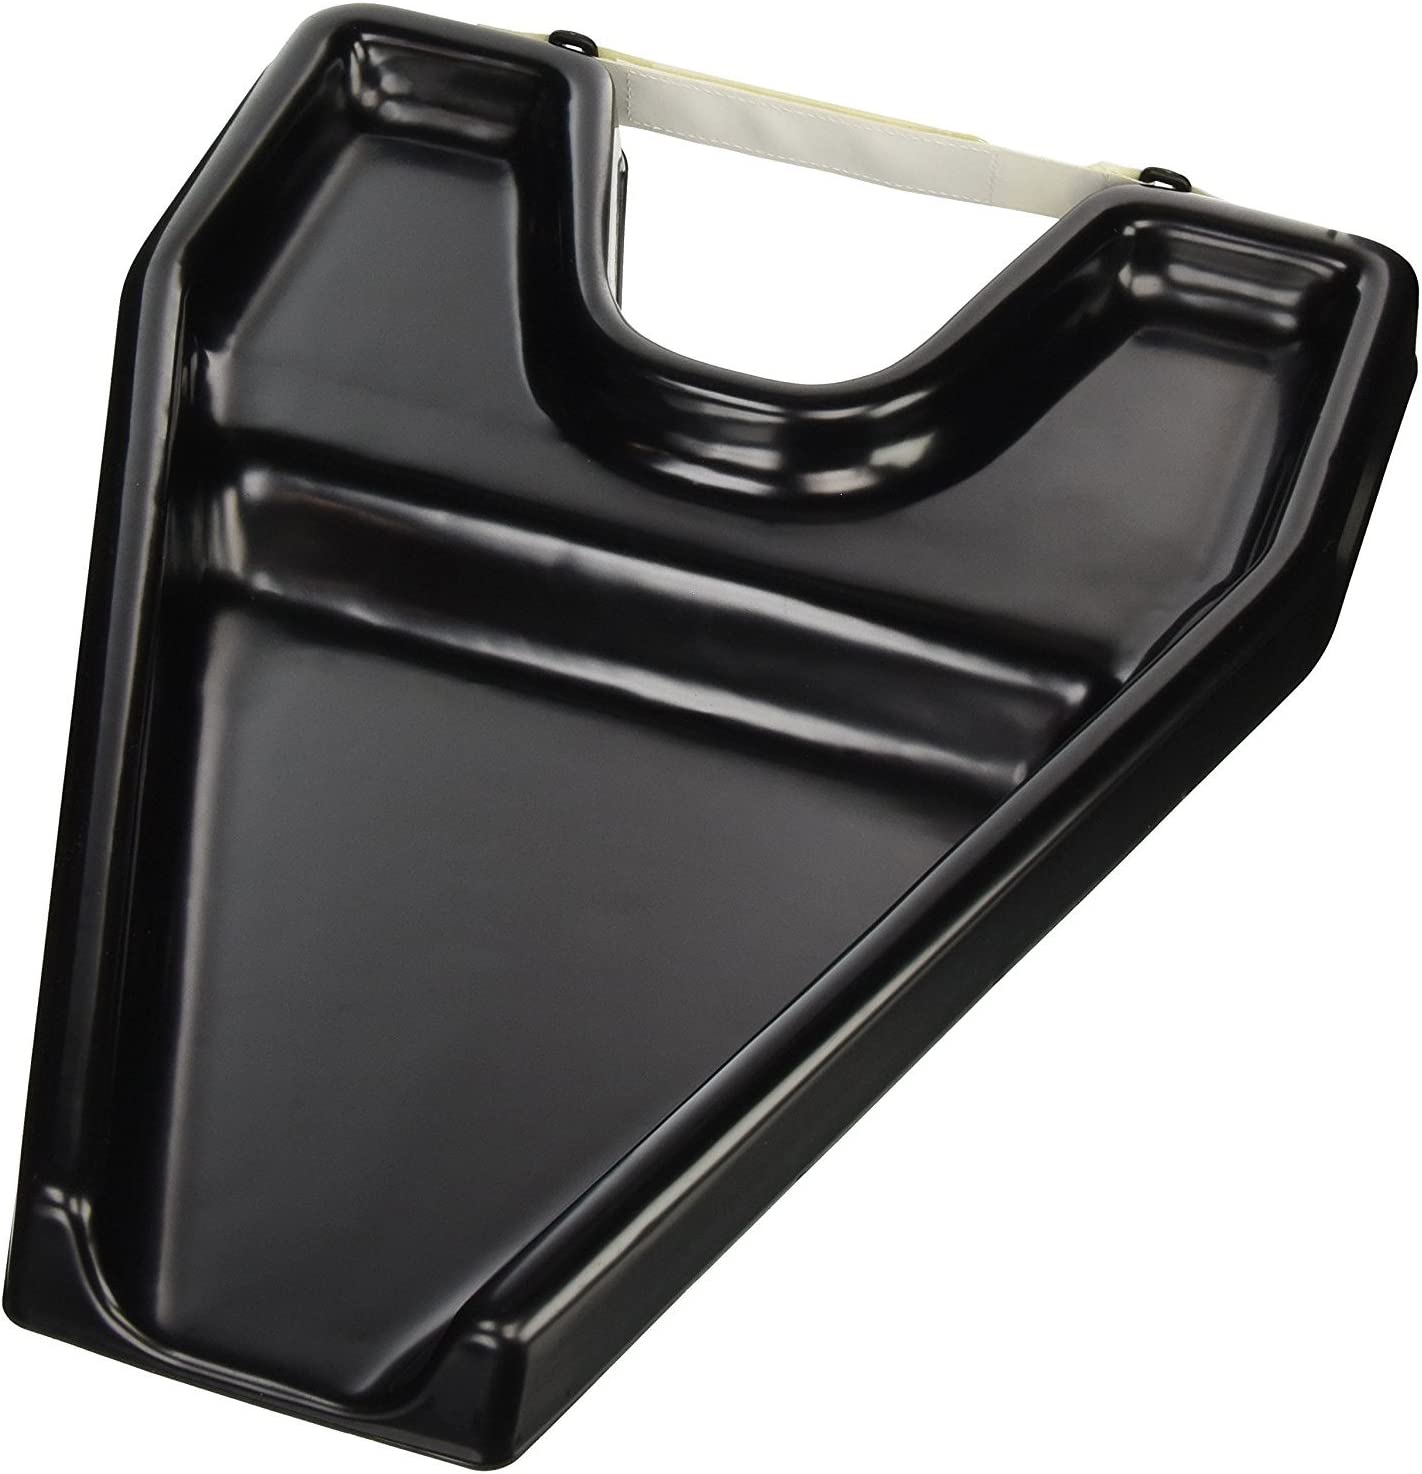 Crisnails Lavacabezas Portátil para Silla Regulable y Basculante, Bandeja Portátil, Color Negro (Negro)